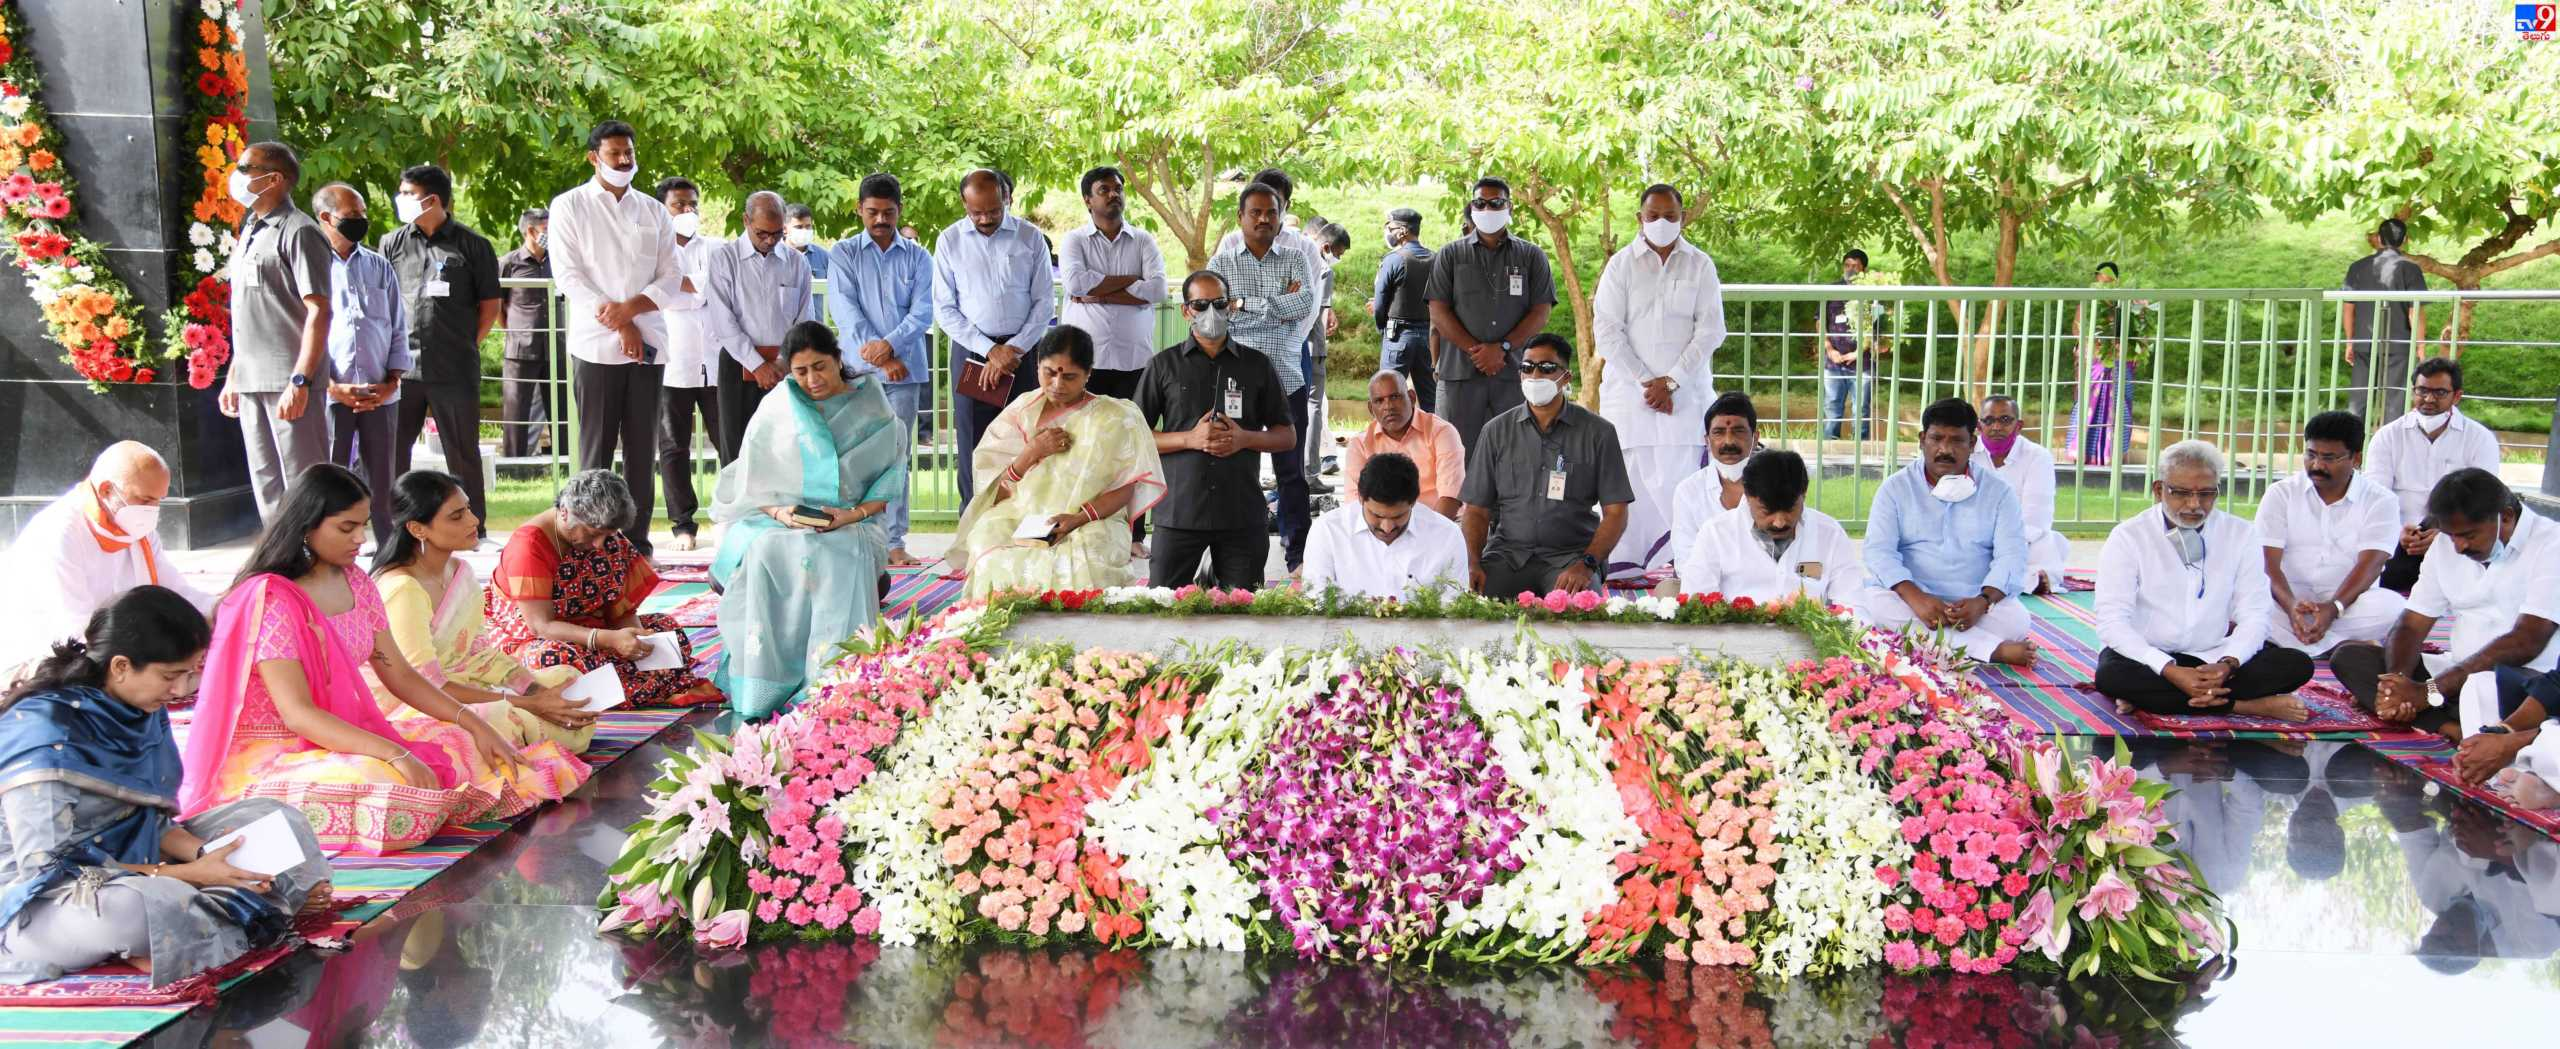 YS Jagan Tributes YS Raja Sekhar Rddy, వైఎస్సార్కు ముఖ్యమంత్రి జగన్ నివాళి